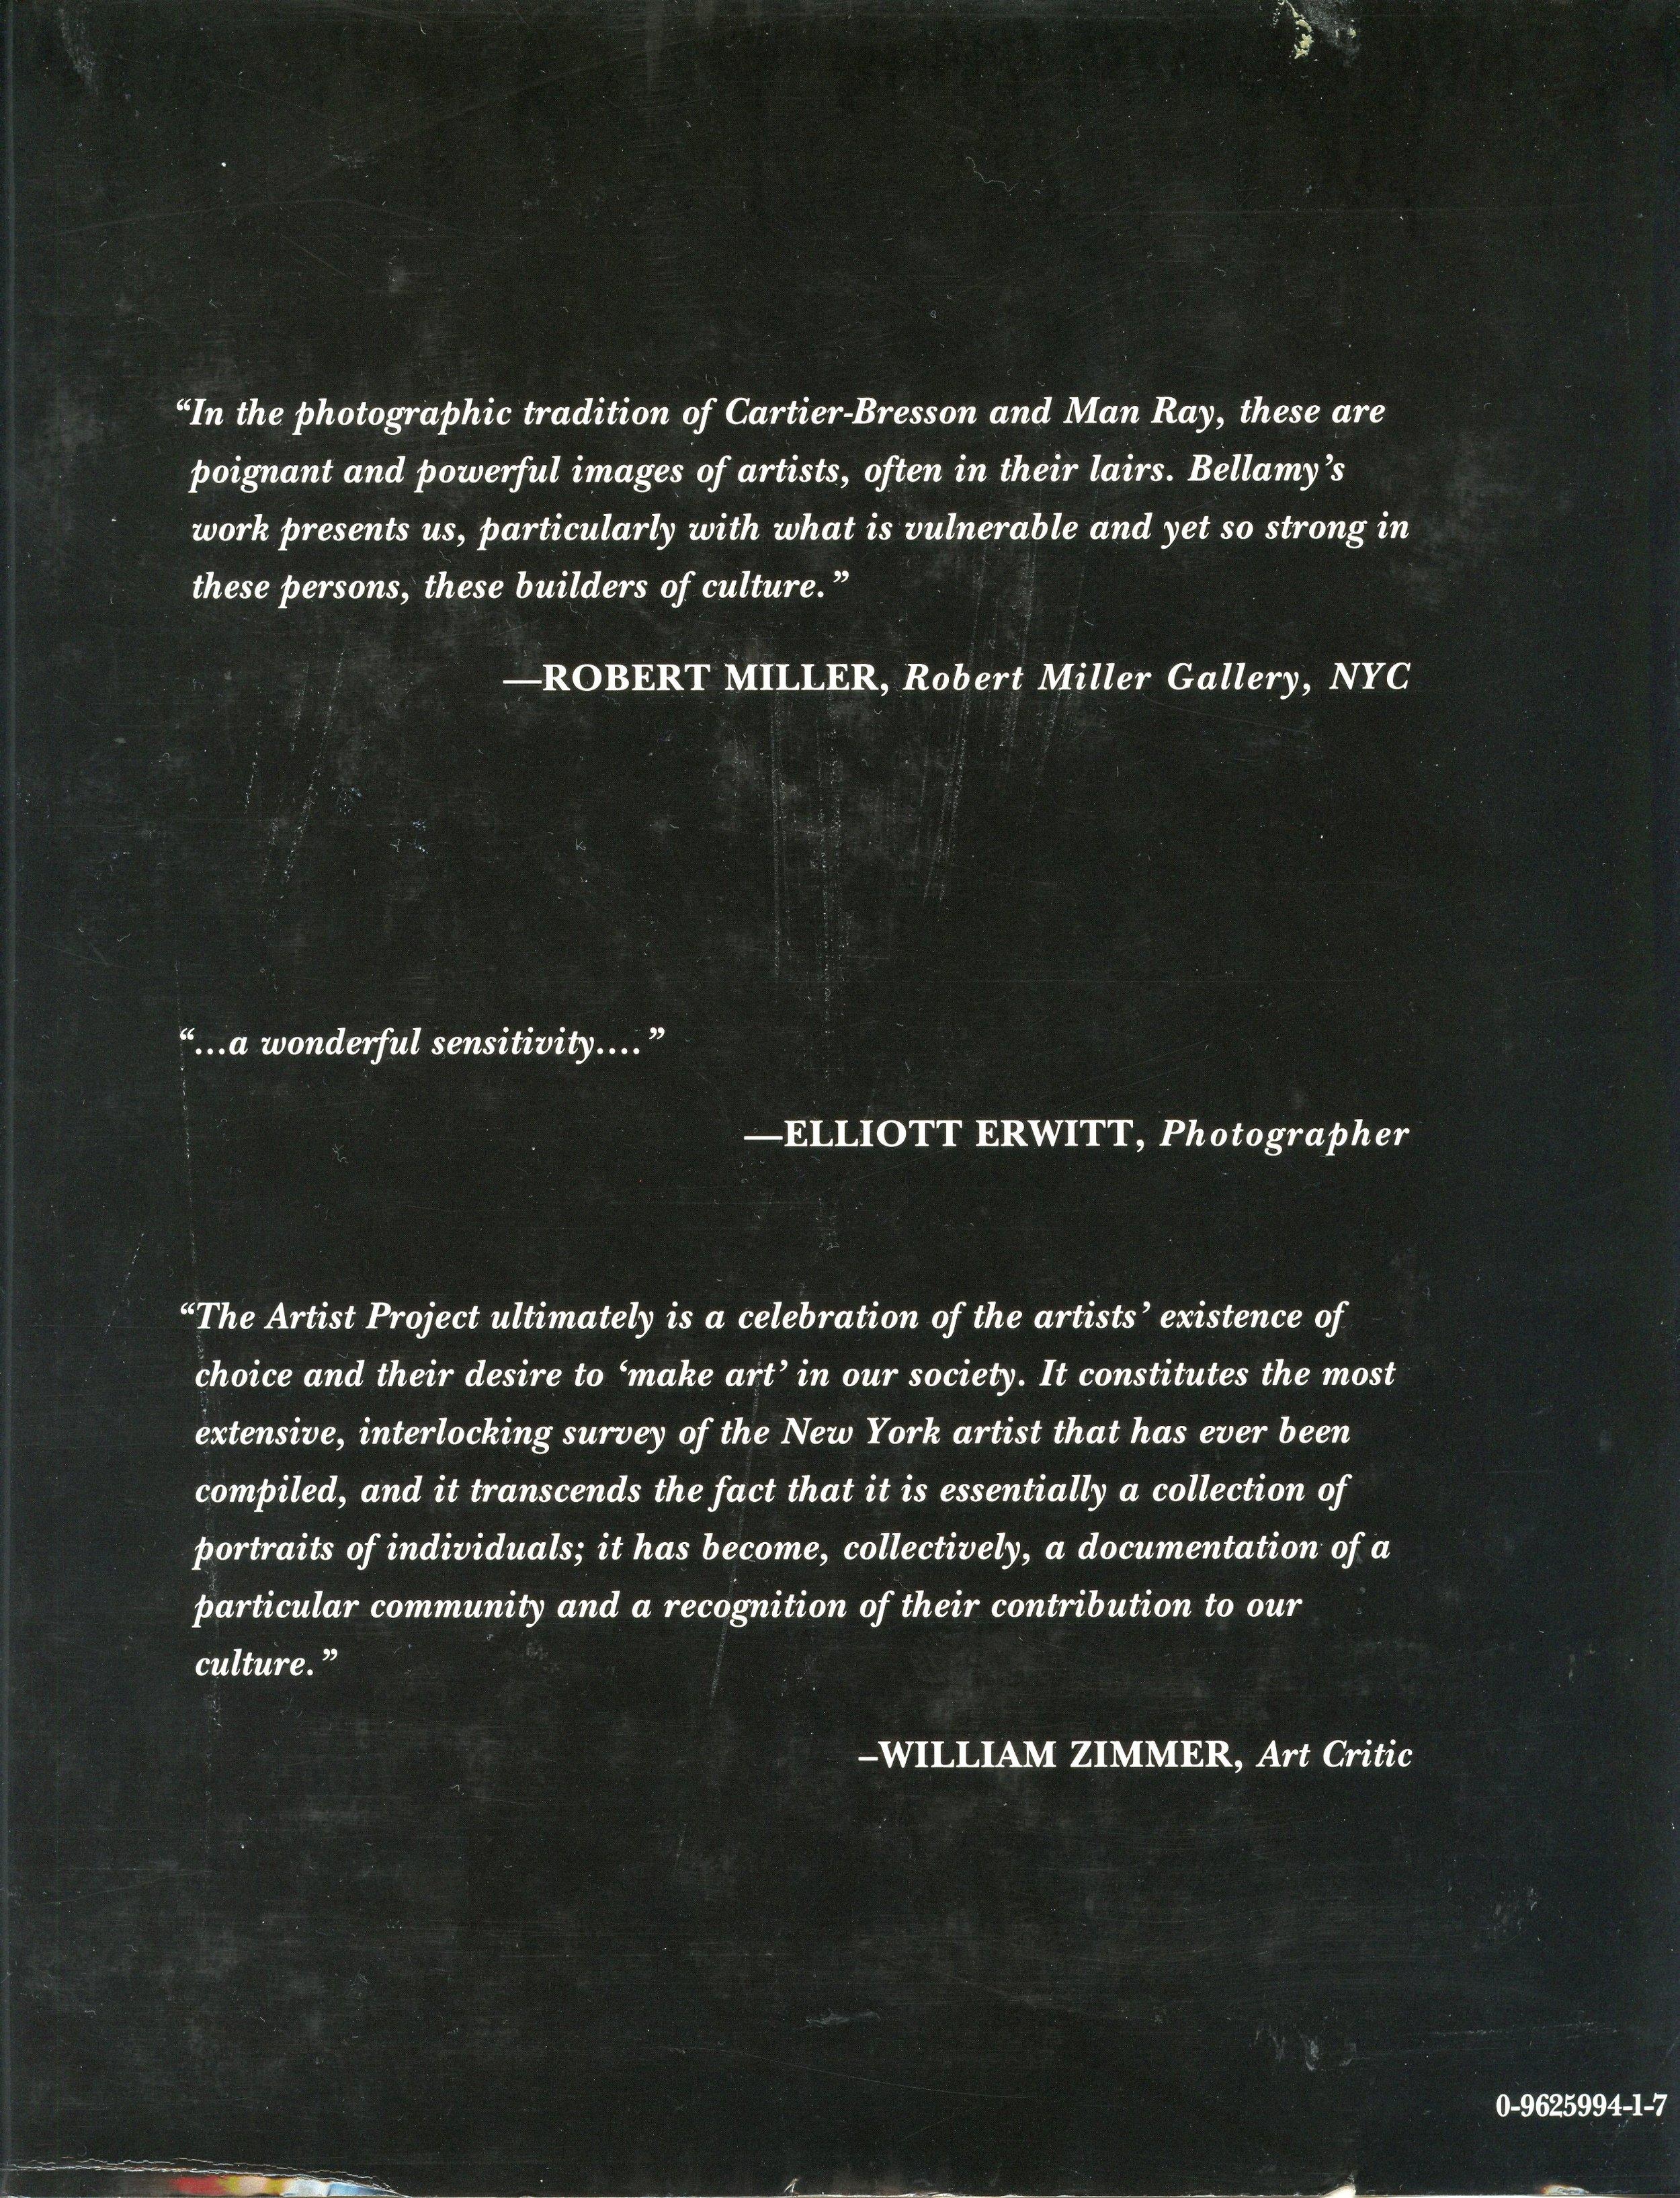 artist project back cover.jpg